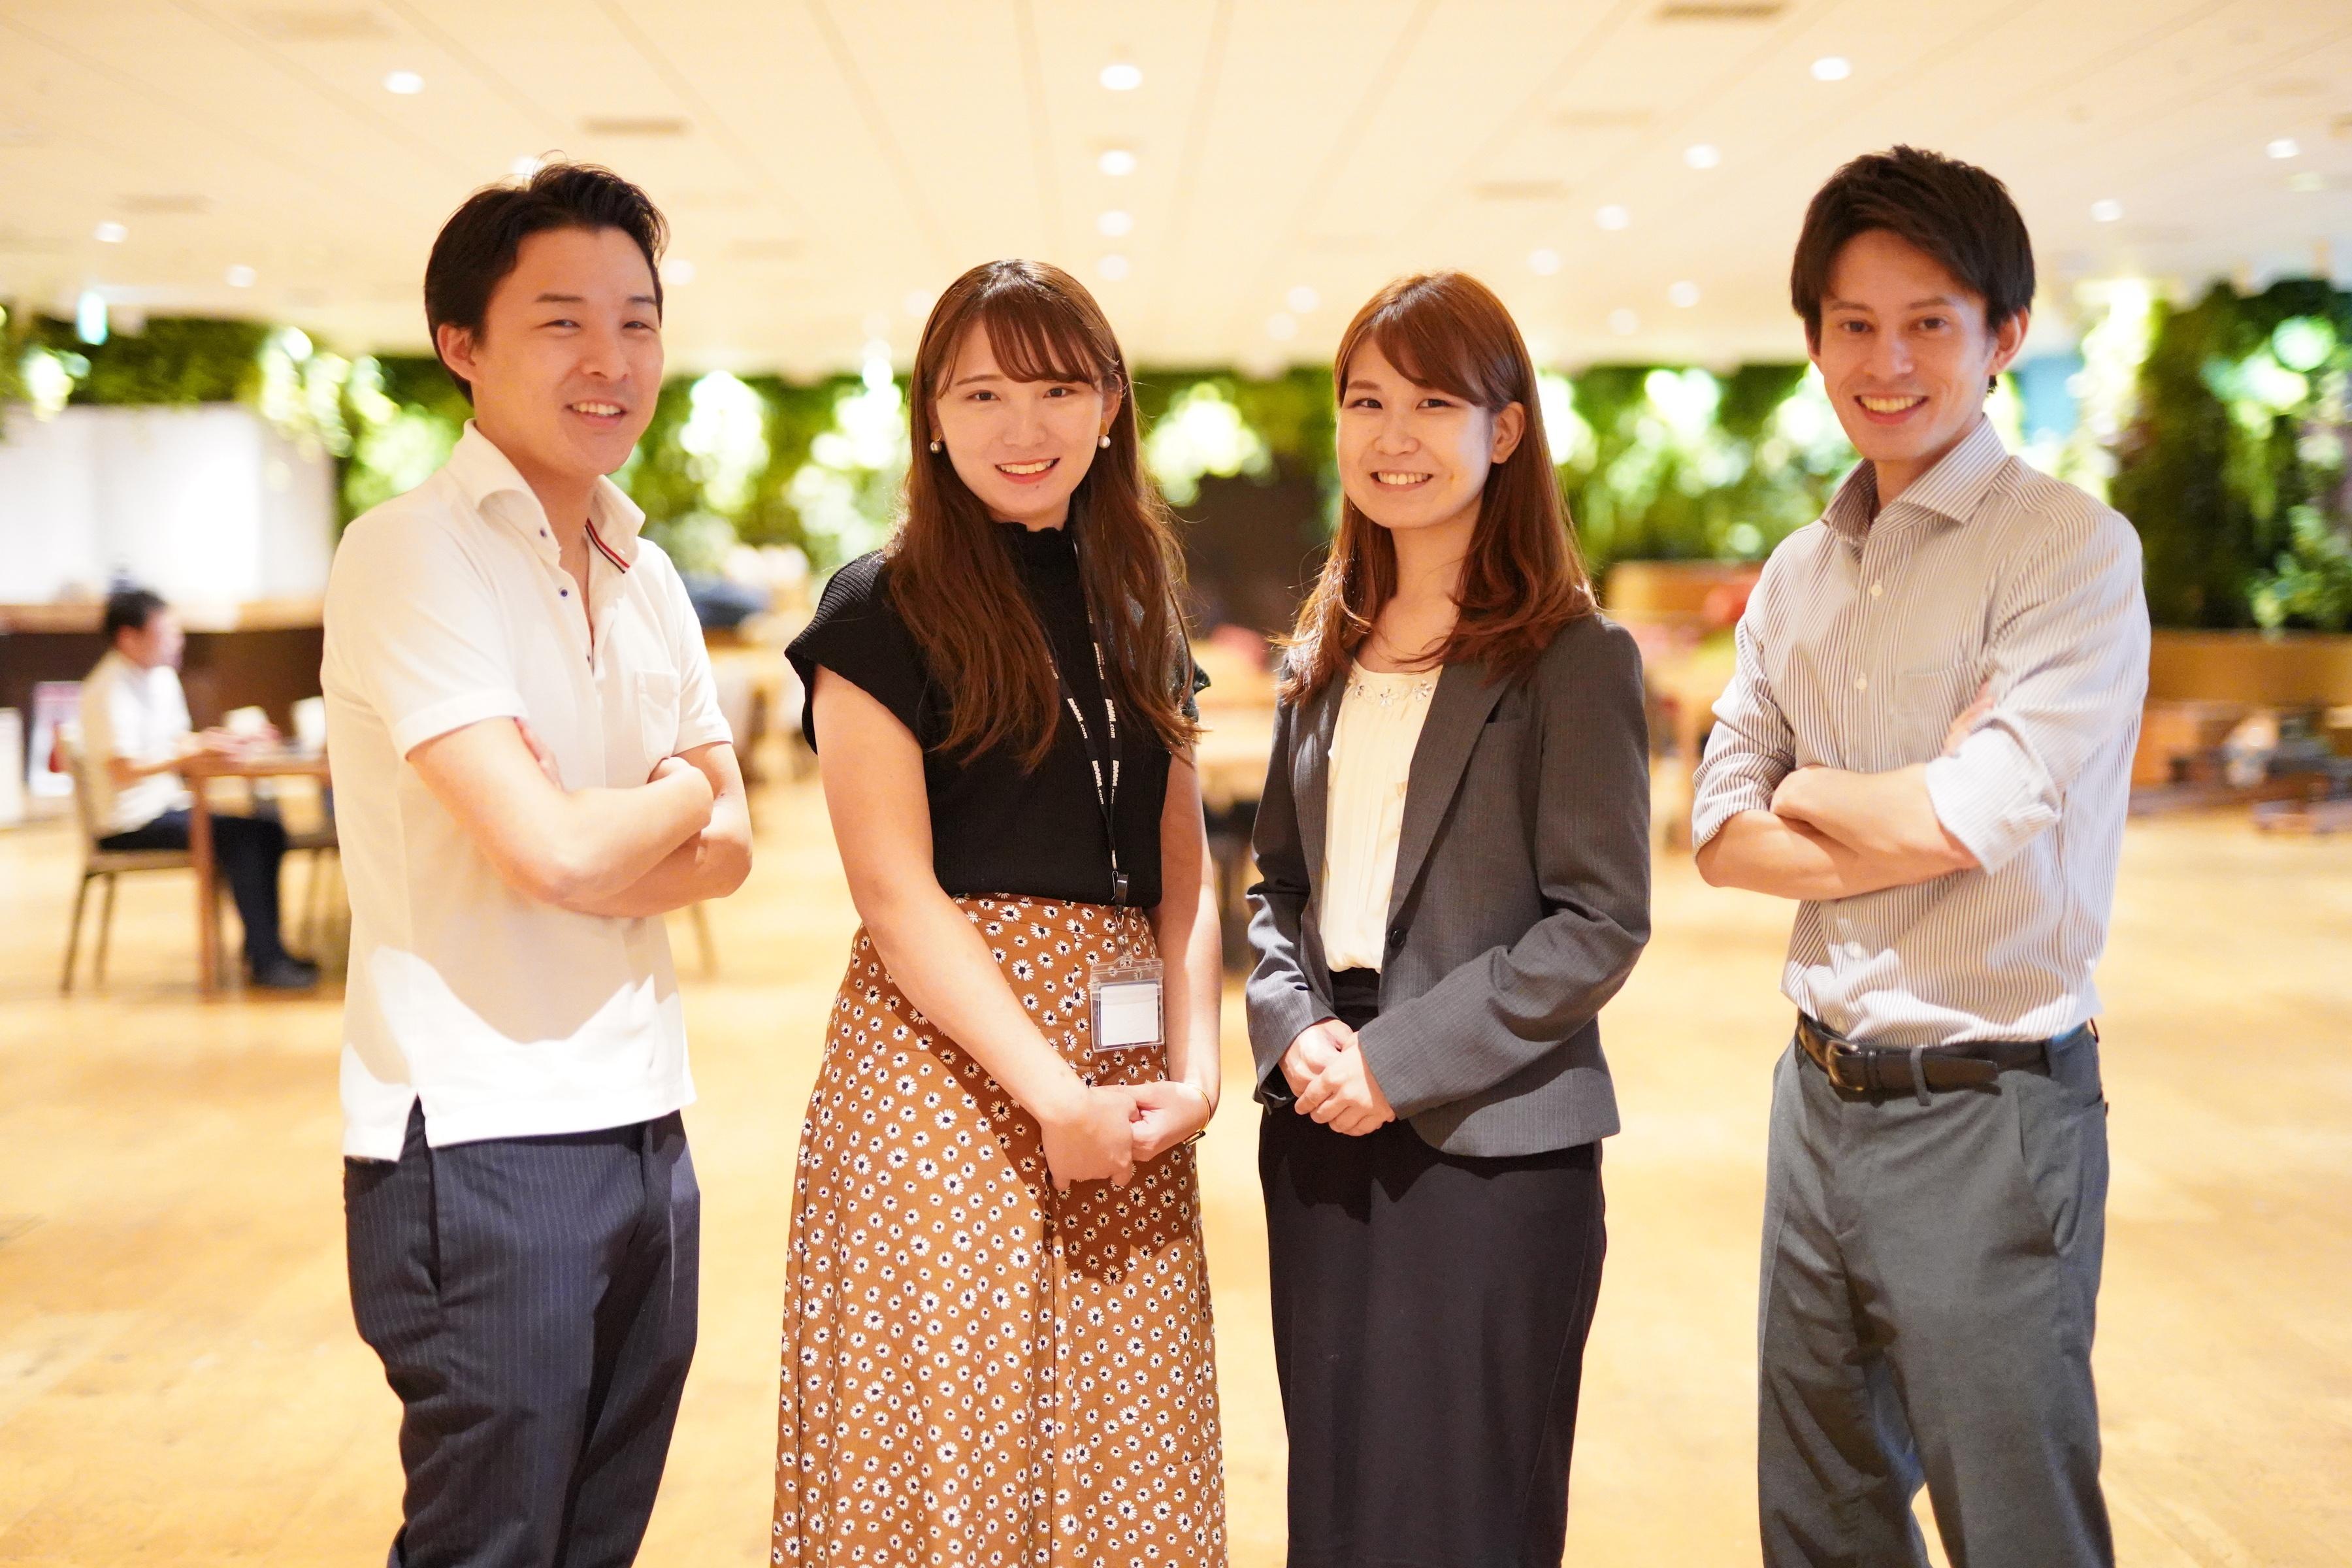 【DMM WEBCAMP@東京】プログラミングスクールでエンジニアメンターを大募集!!